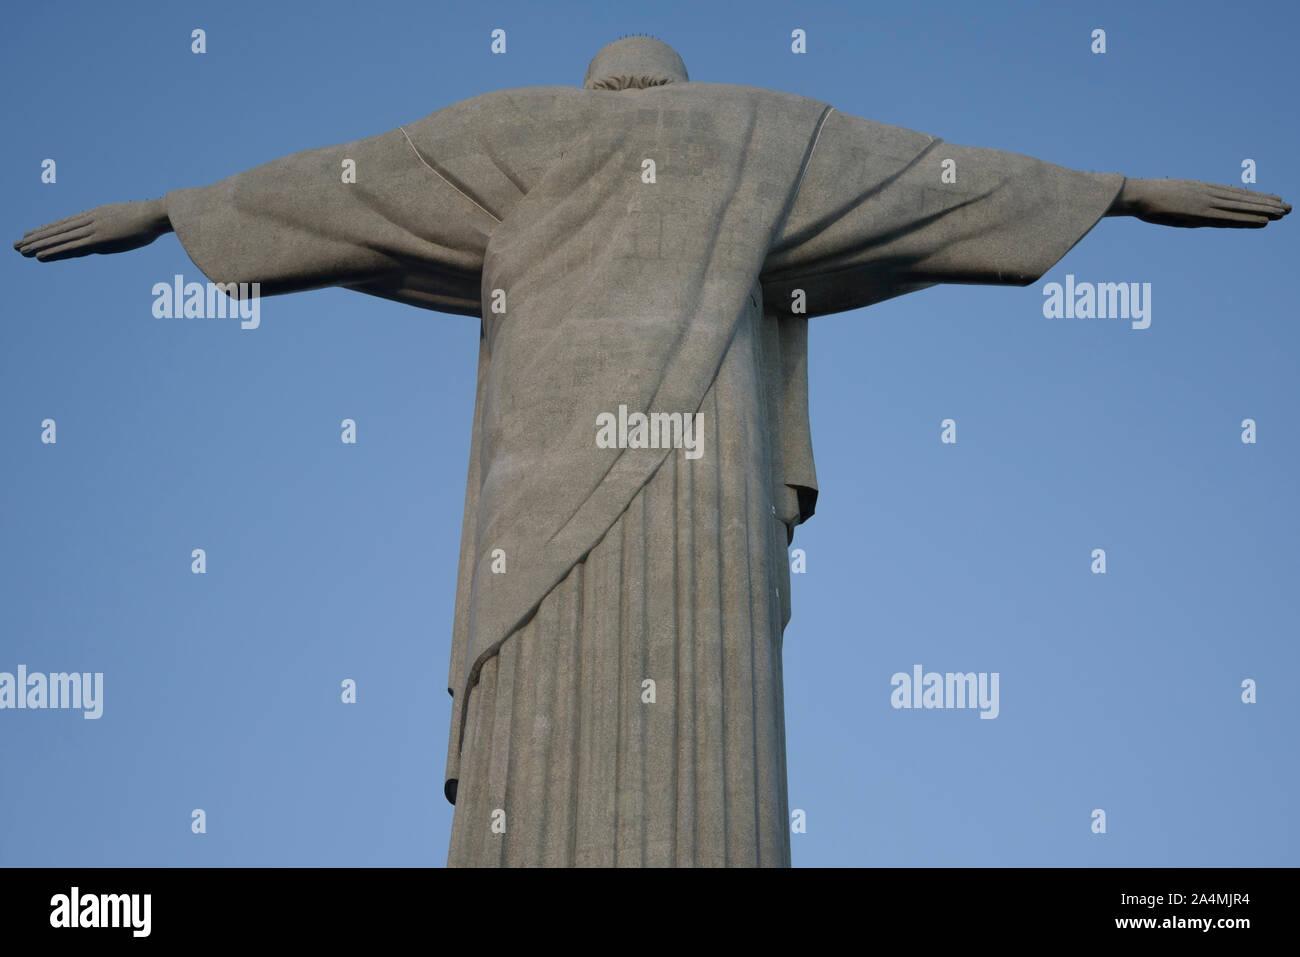 Rio de Janeiro, Brasil - Marzo 28, 2016: la estatua del Cristo Redentor en Rio de Janeiro - vista trasera Foto de stock